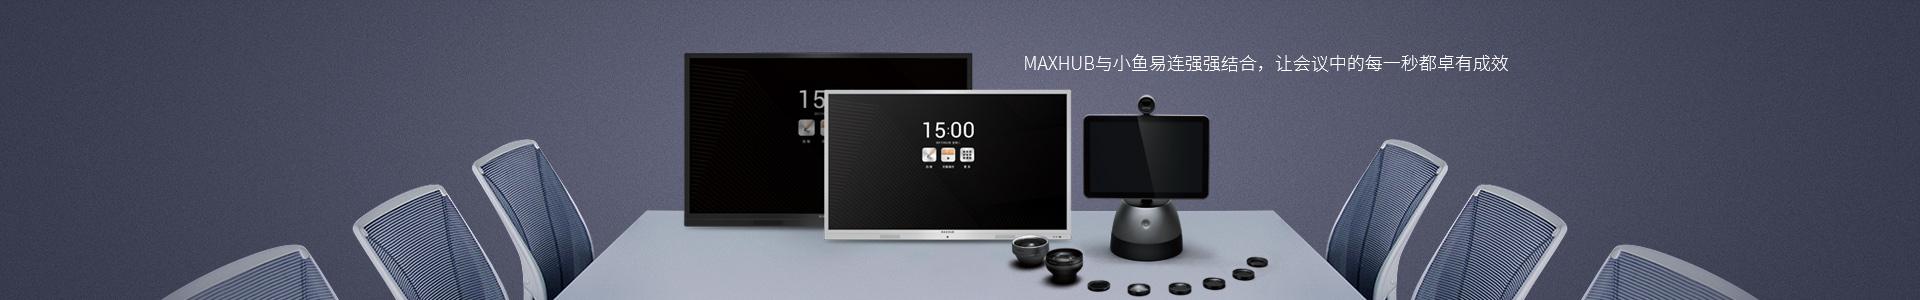 MAXHUB与小鱼易连强强结合,让会议中的每一秒都卓有成效